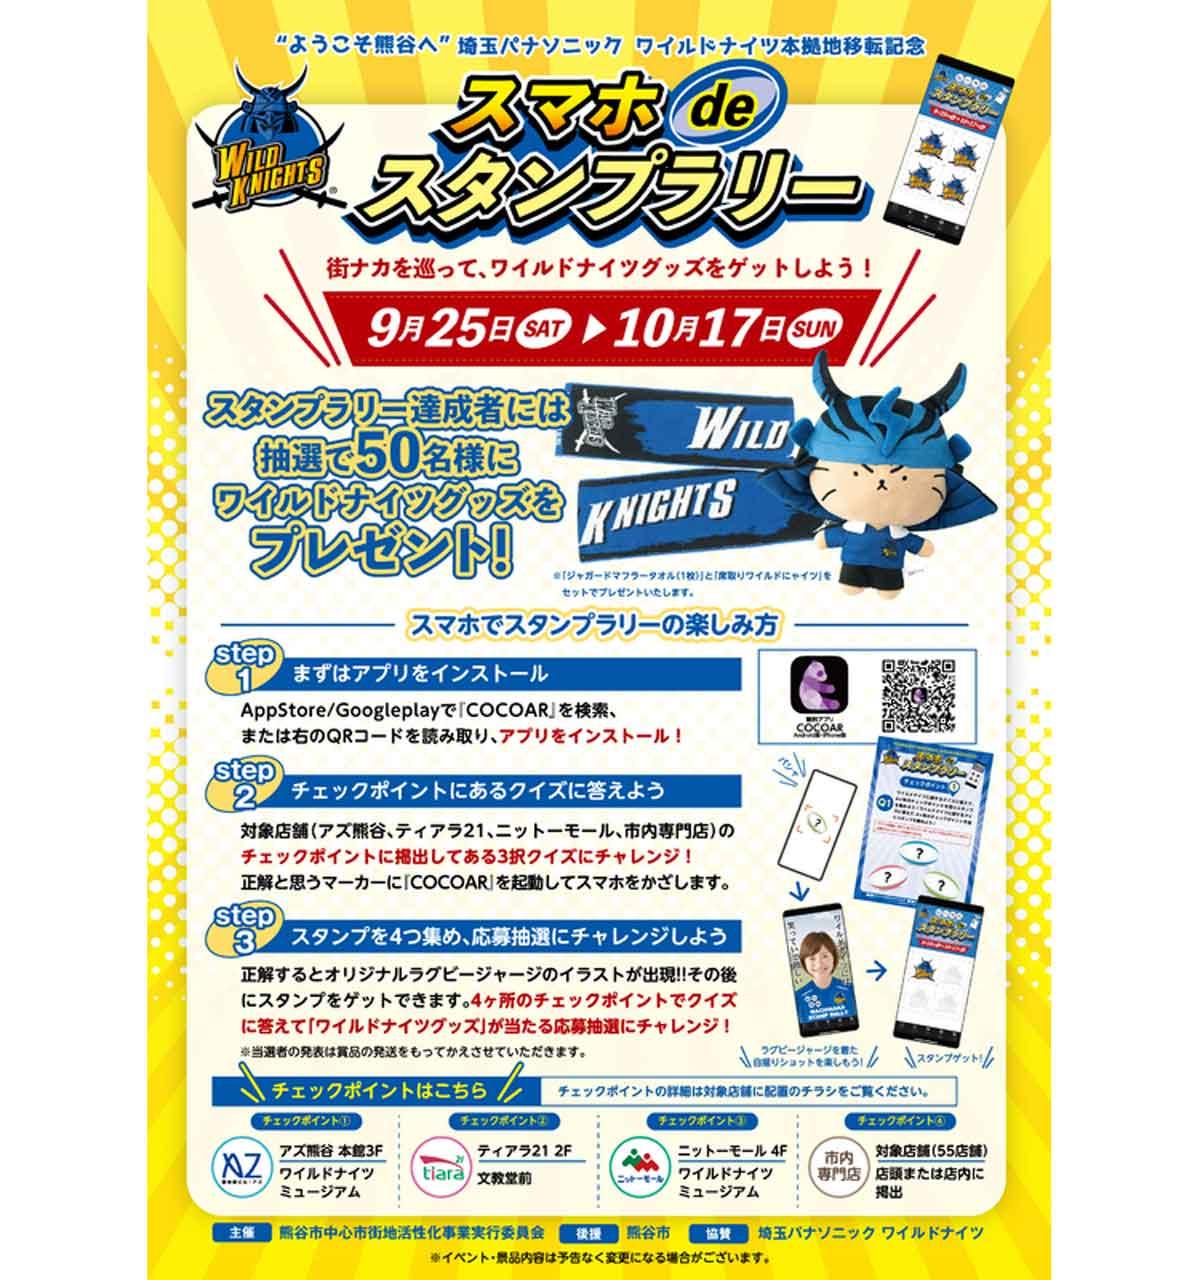 ARスタンプラリーで「埼玉パナソニック ワイルドナイツ」のグッズが当たる!熊谷市への本拠地移転を記念して開催